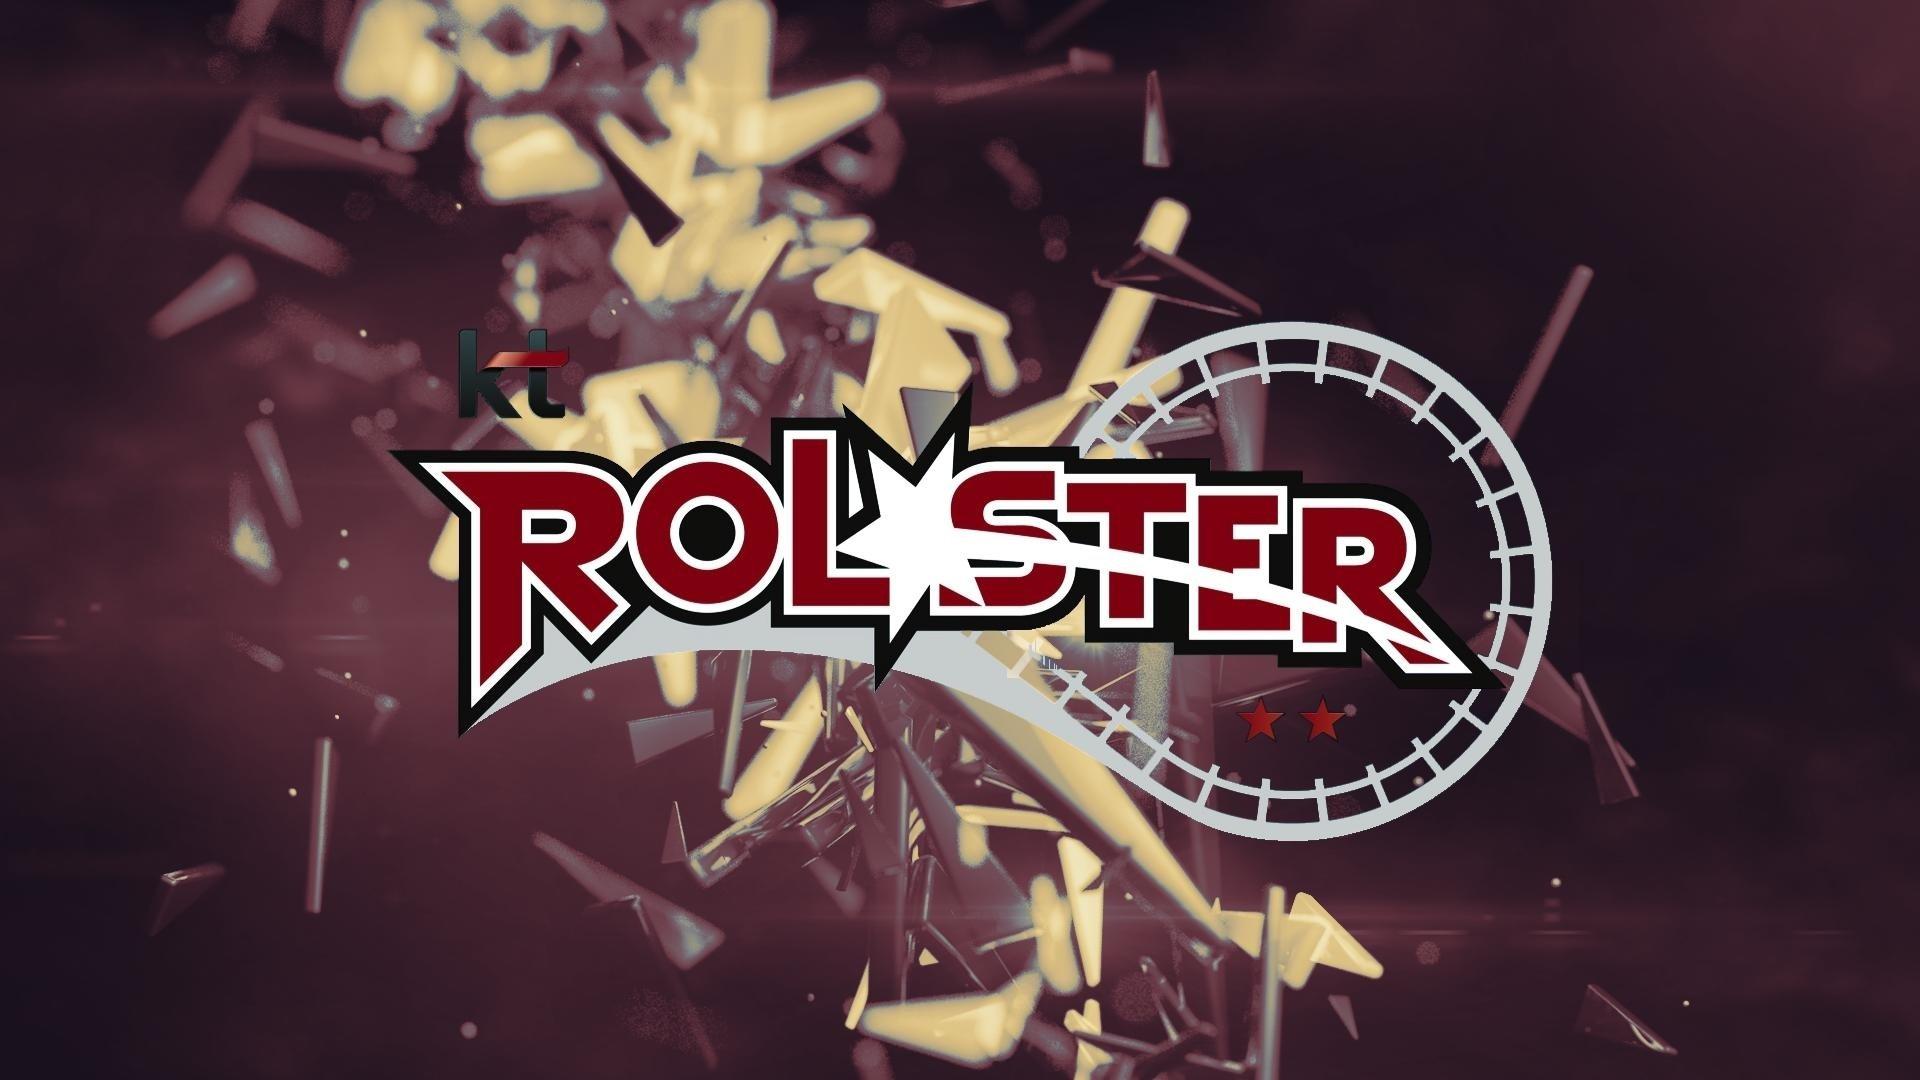 kt_rolster2